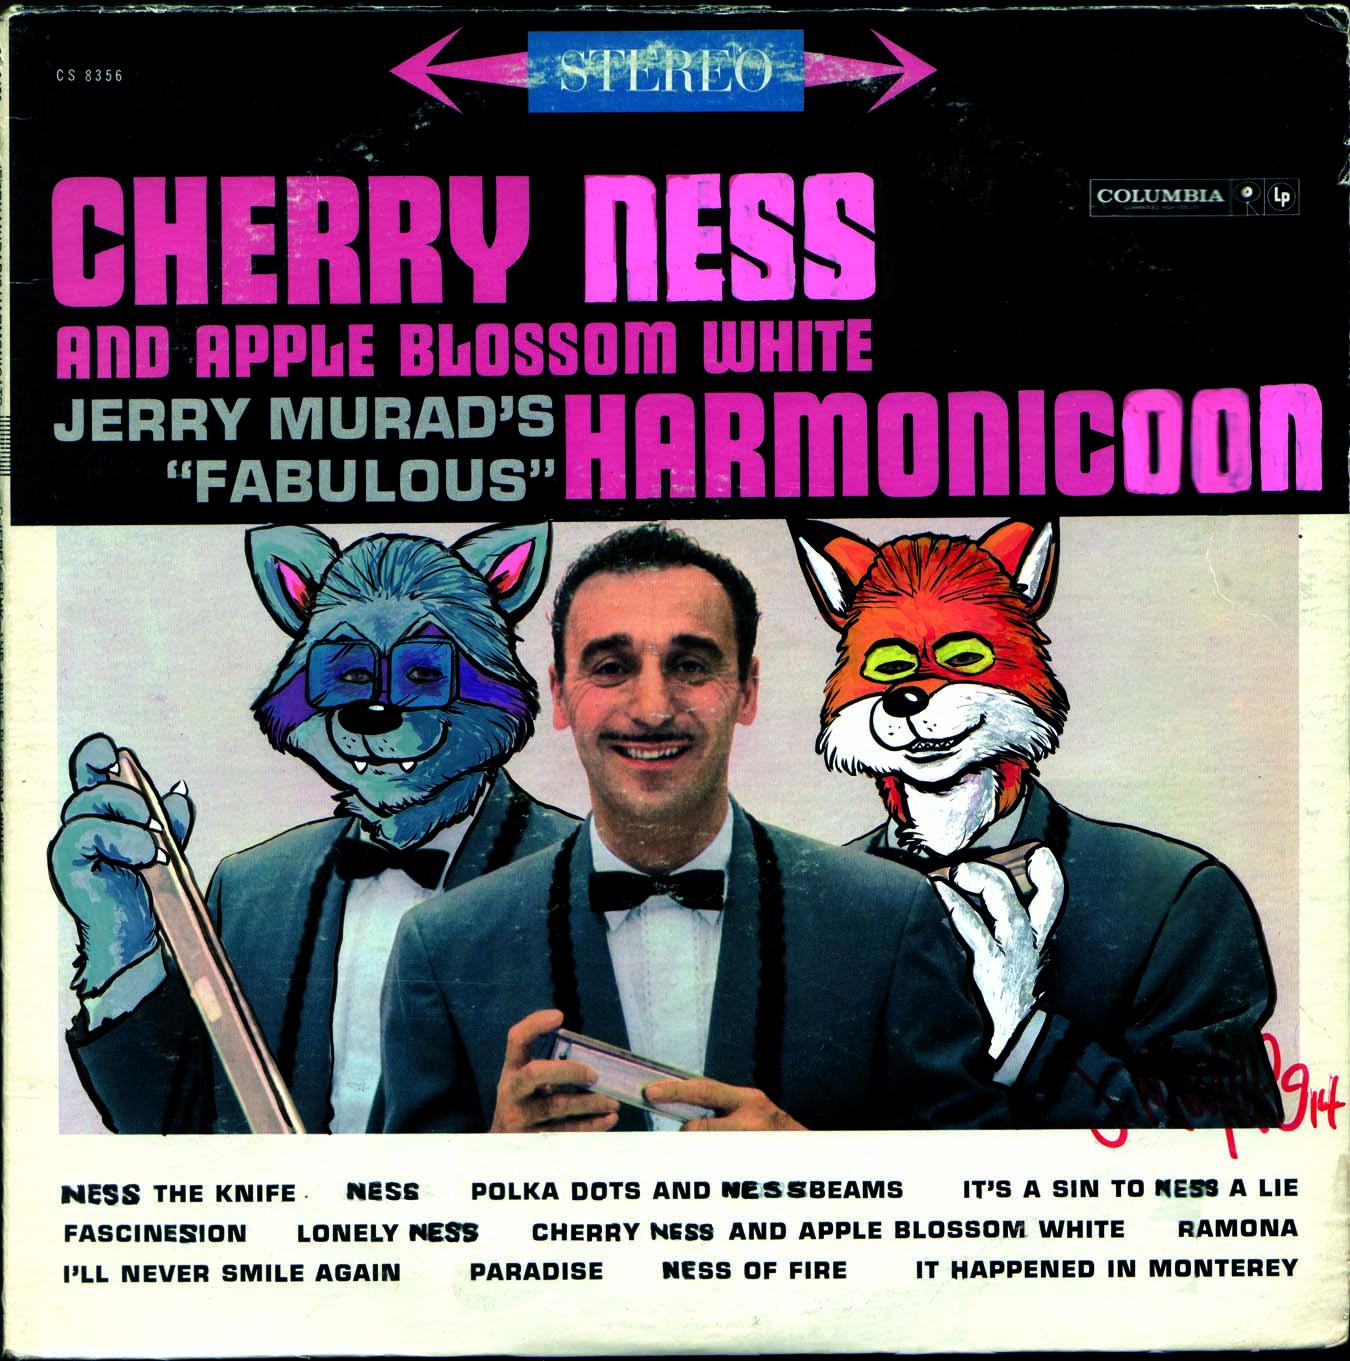 cherryness